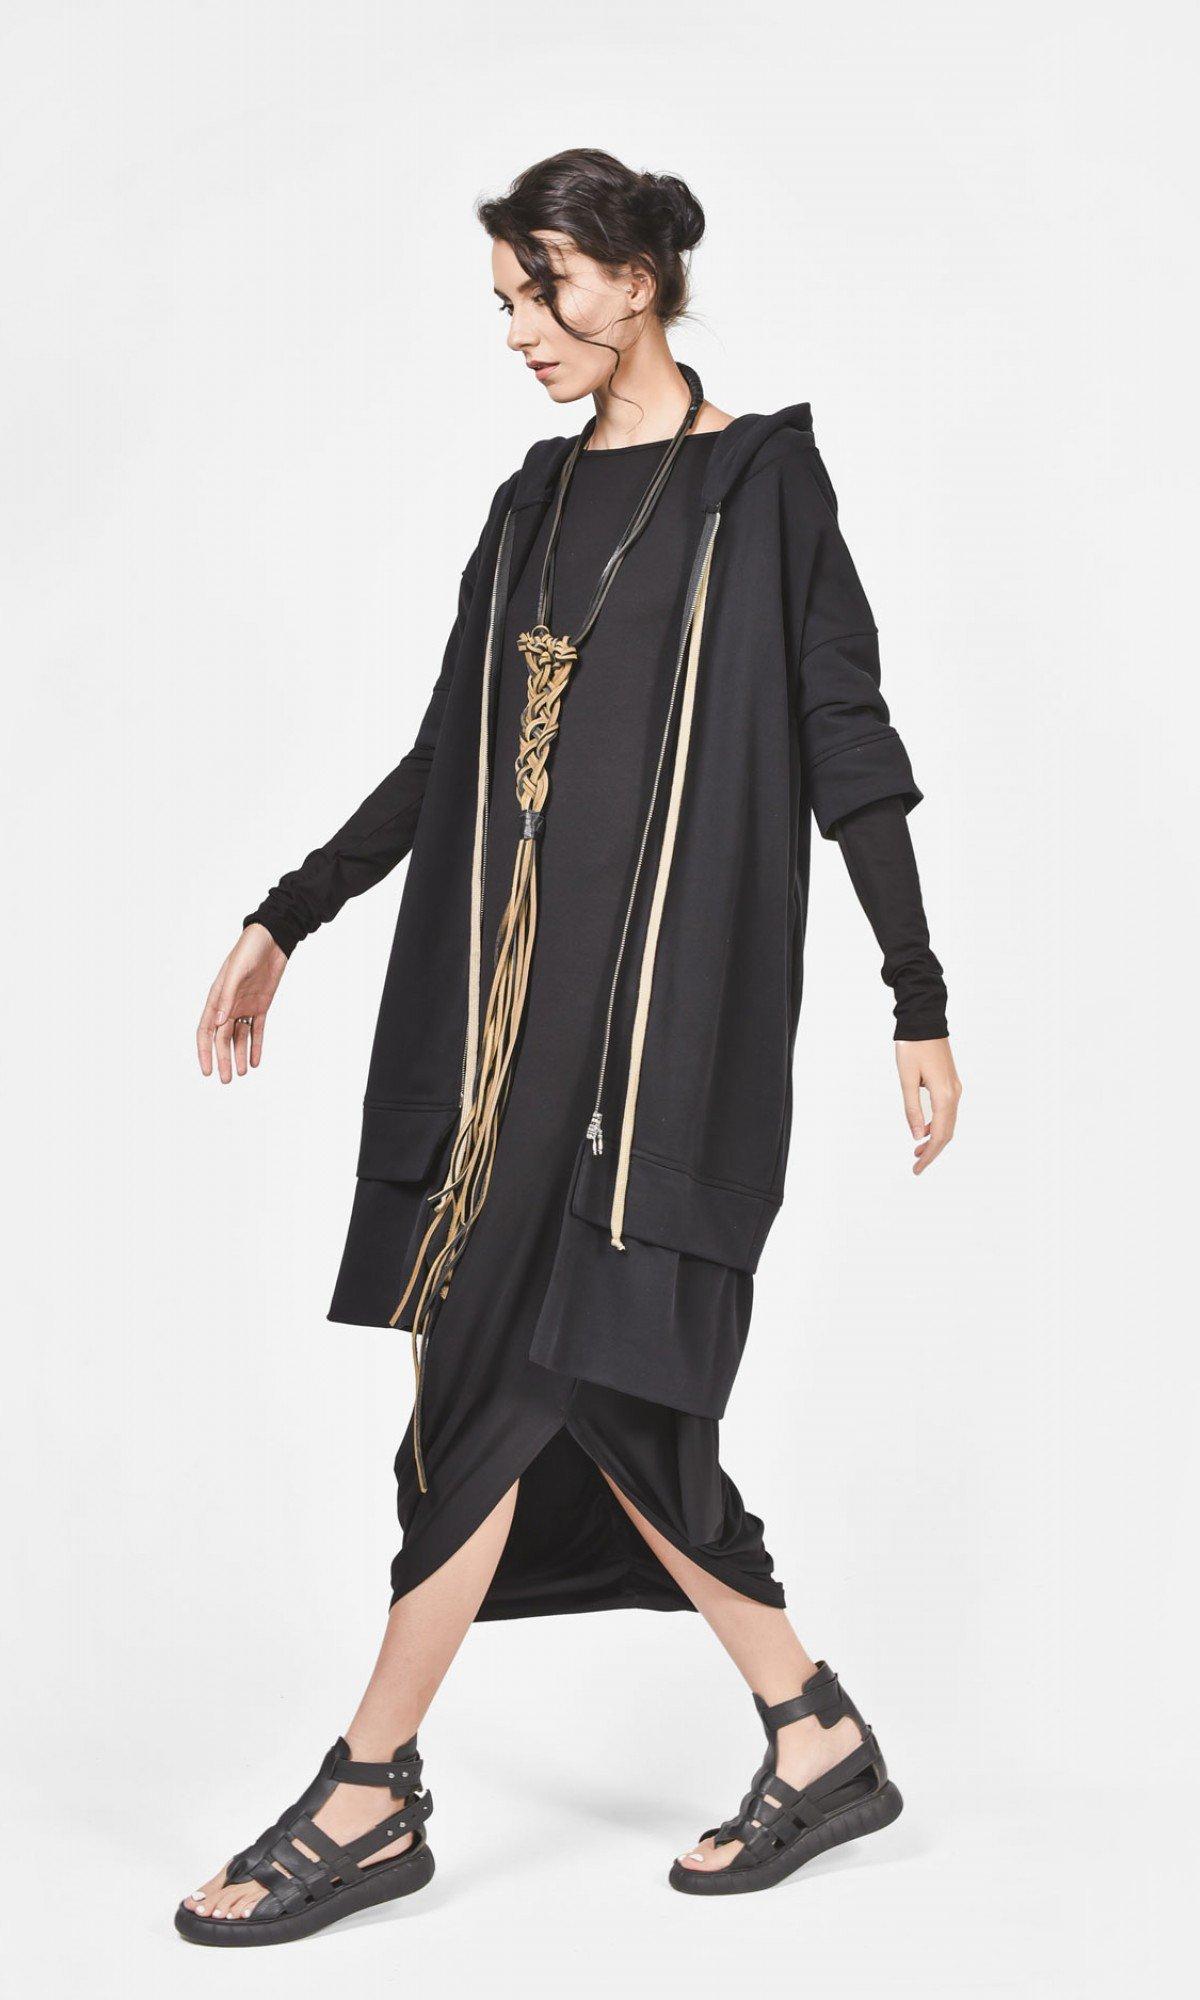 Asymmetric Black Dress with front linen pocket A03597